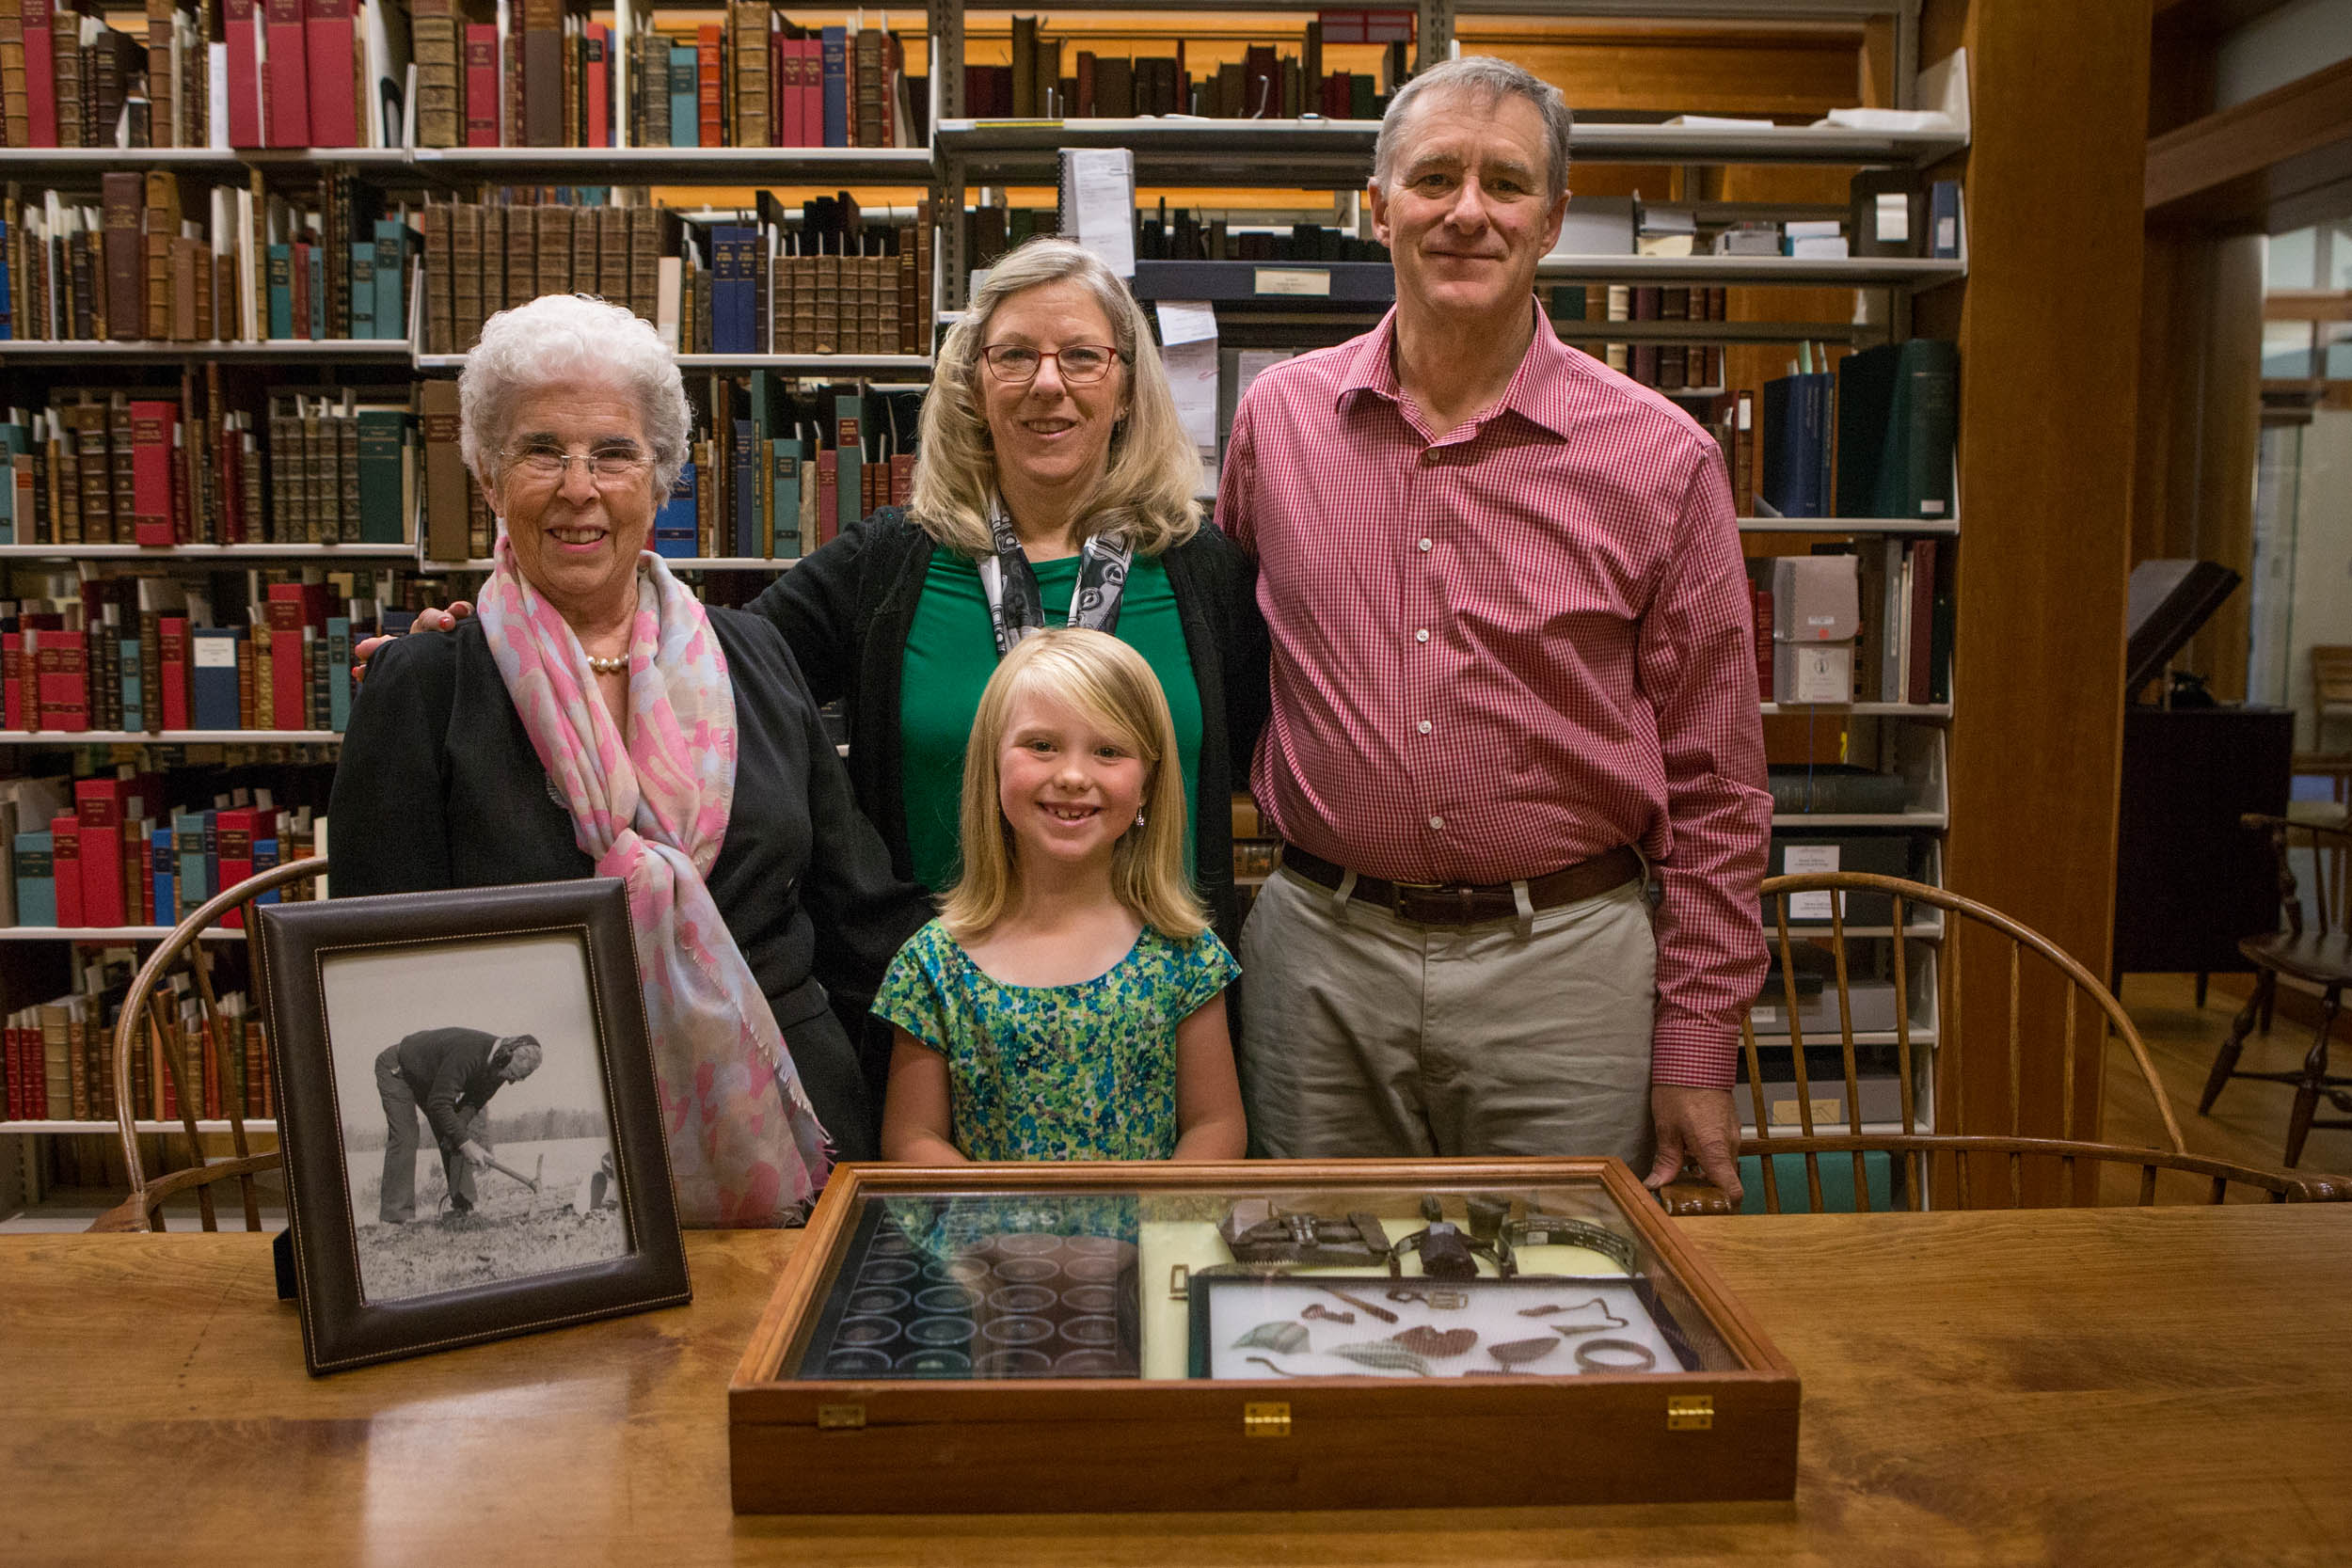 Civil War Artifact Donation Brings Life On The Battlefield